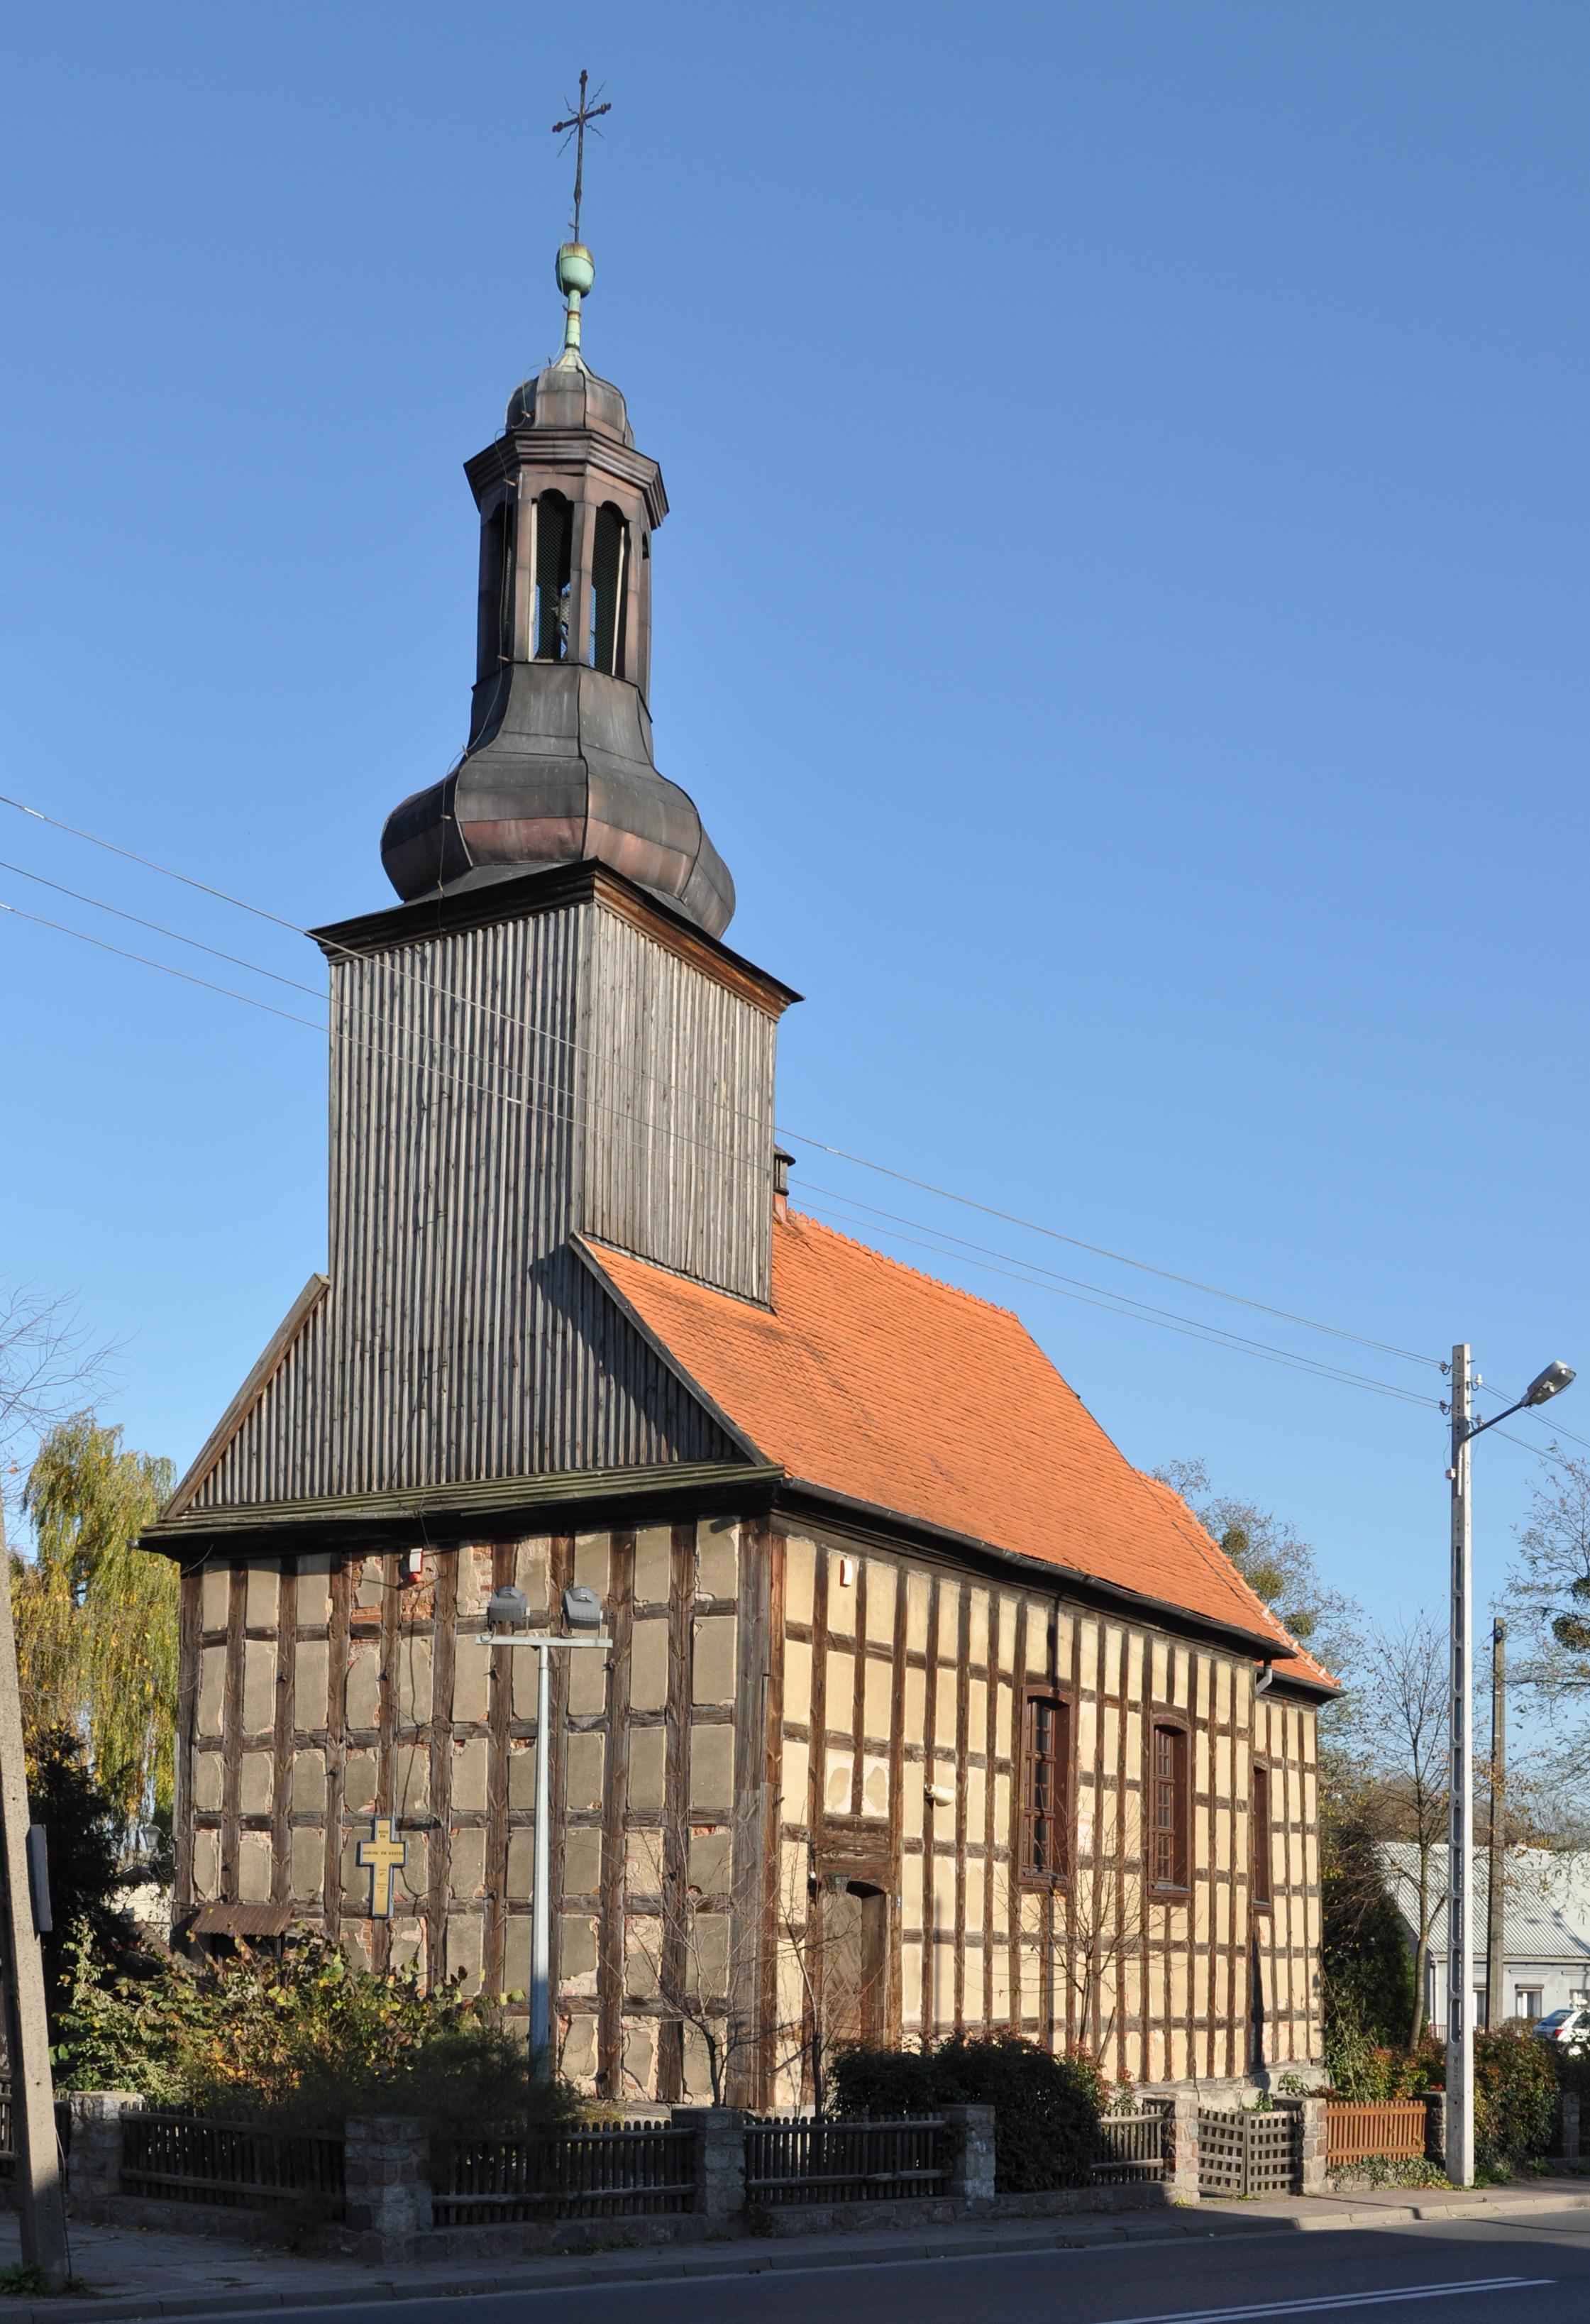 Fileoborniki Wlkp Holy Cross Church 2010 10 Swjpg Wikimedia Commons